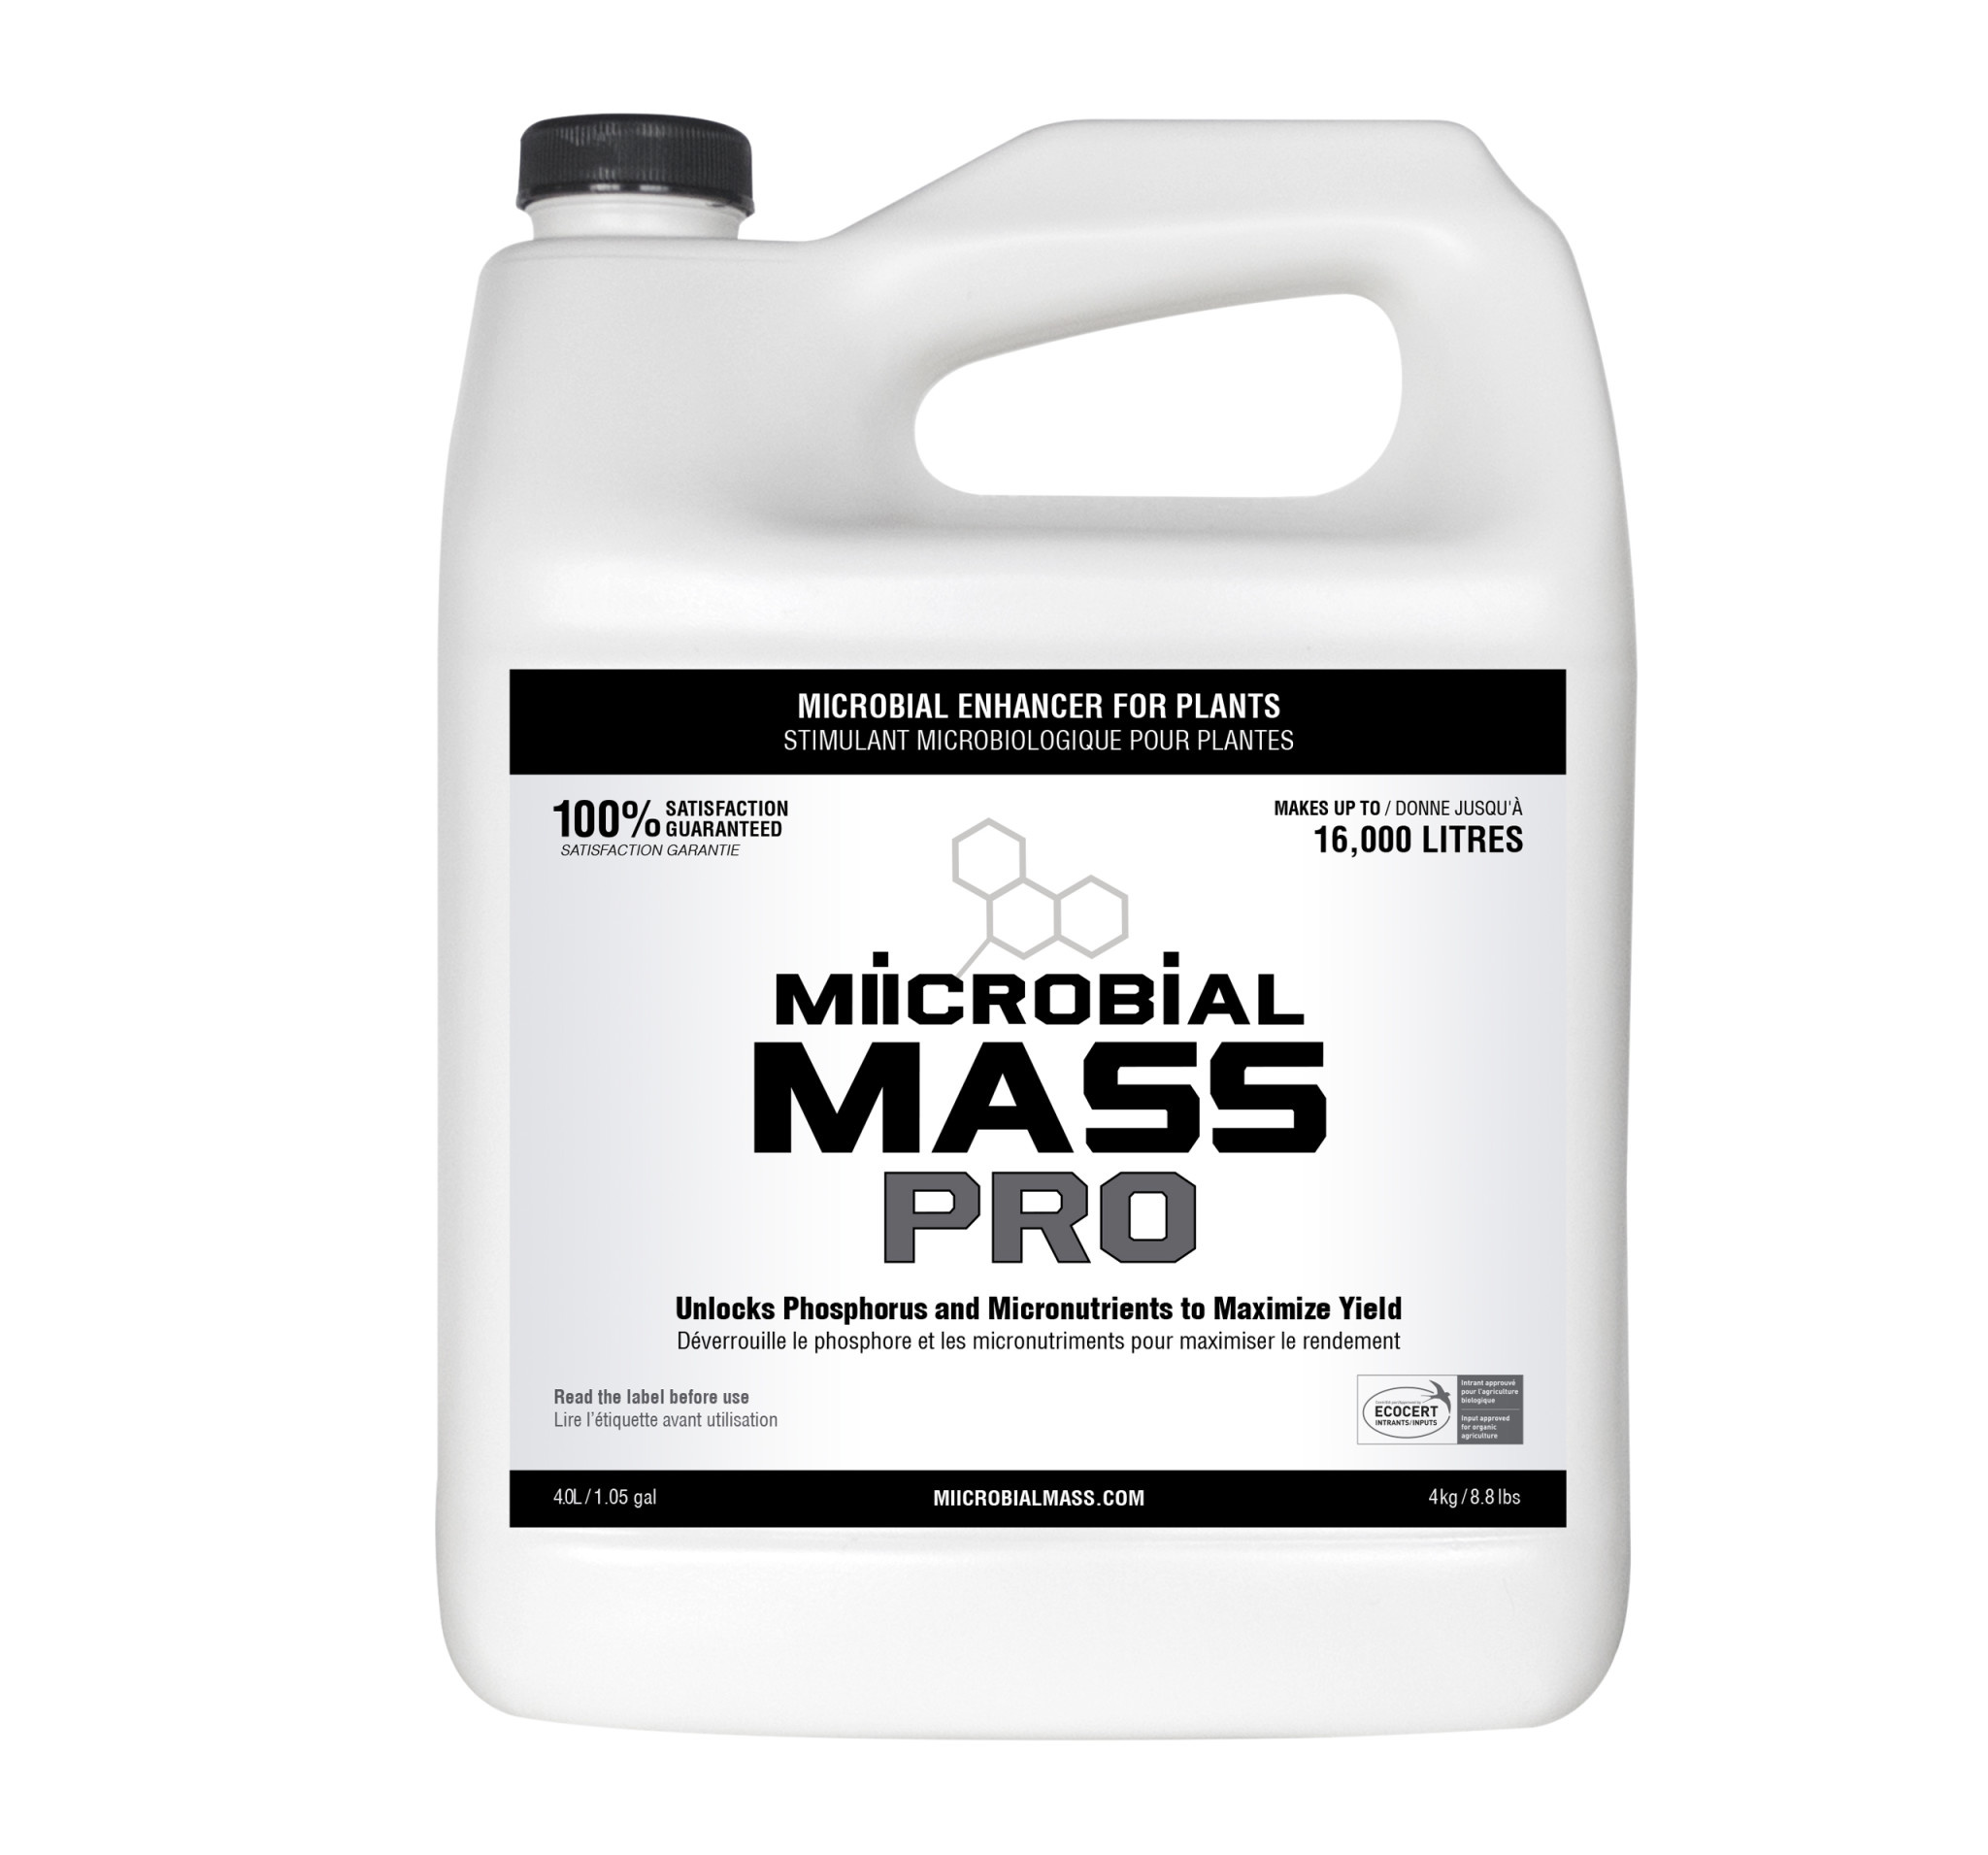 MIIM Horticulture Ltd Miicrobial Mass